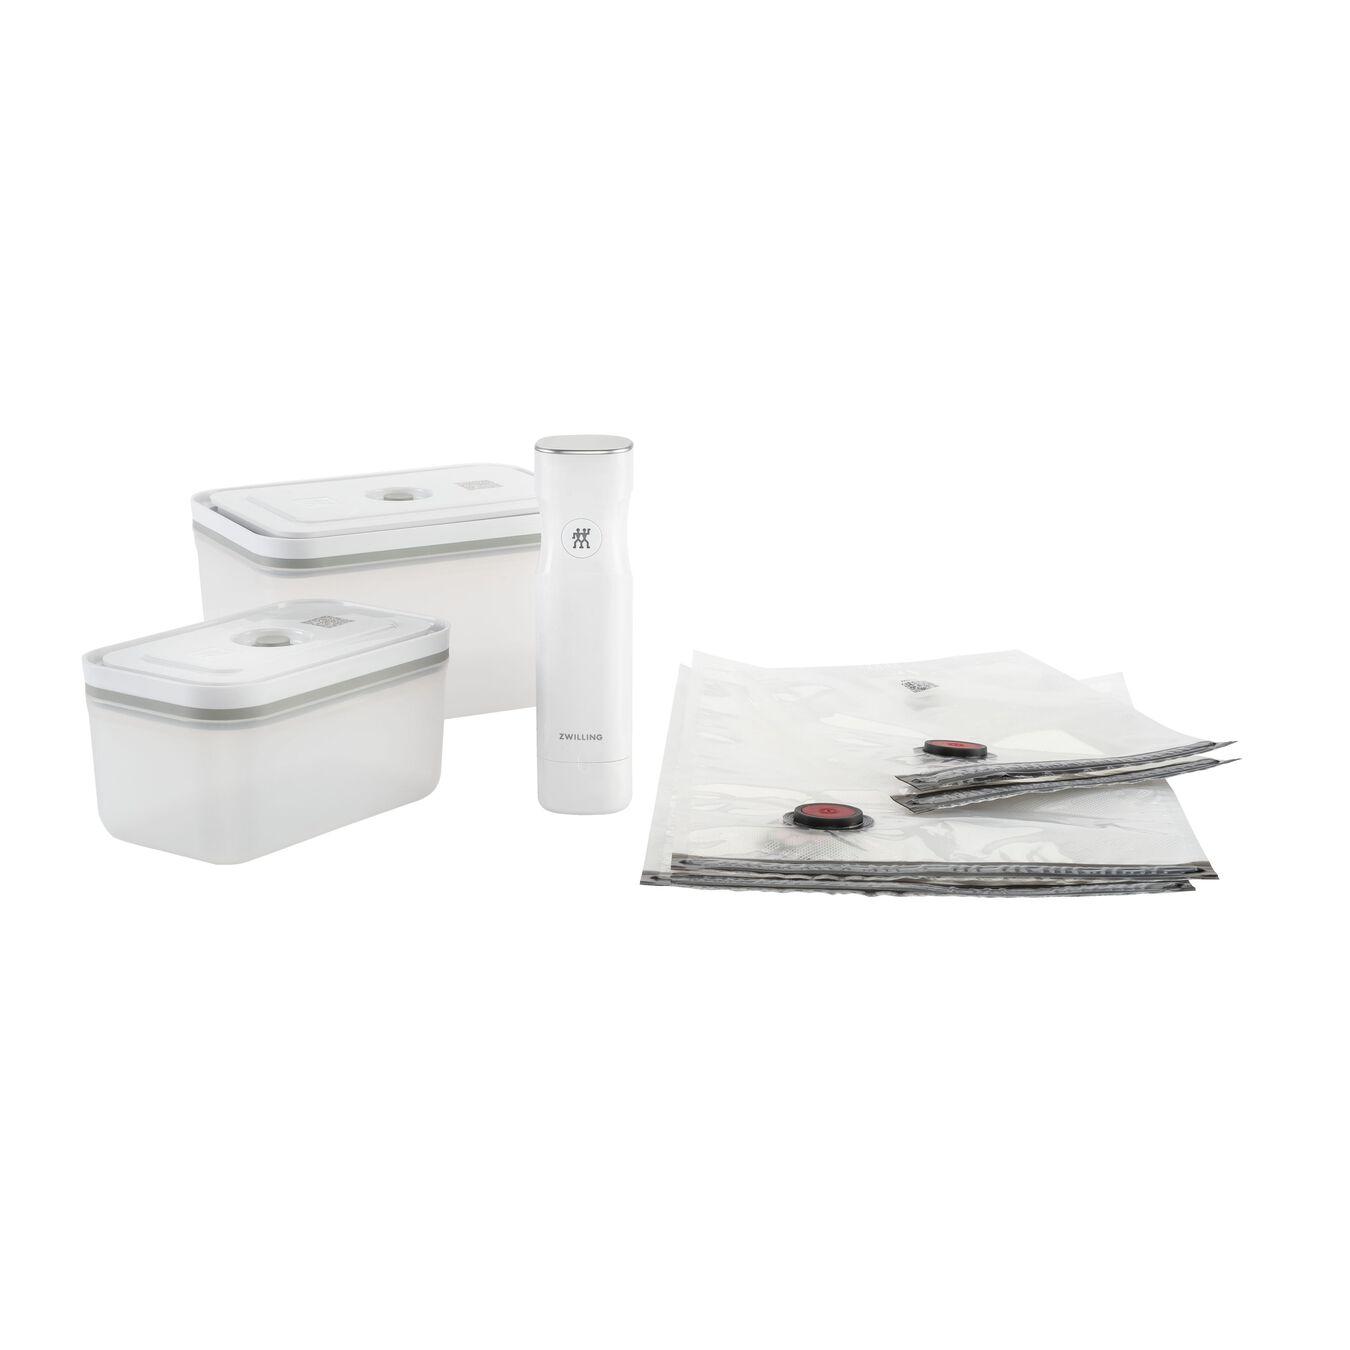 Vacuum starter set, 7-pc, Plastic, White,,large 1